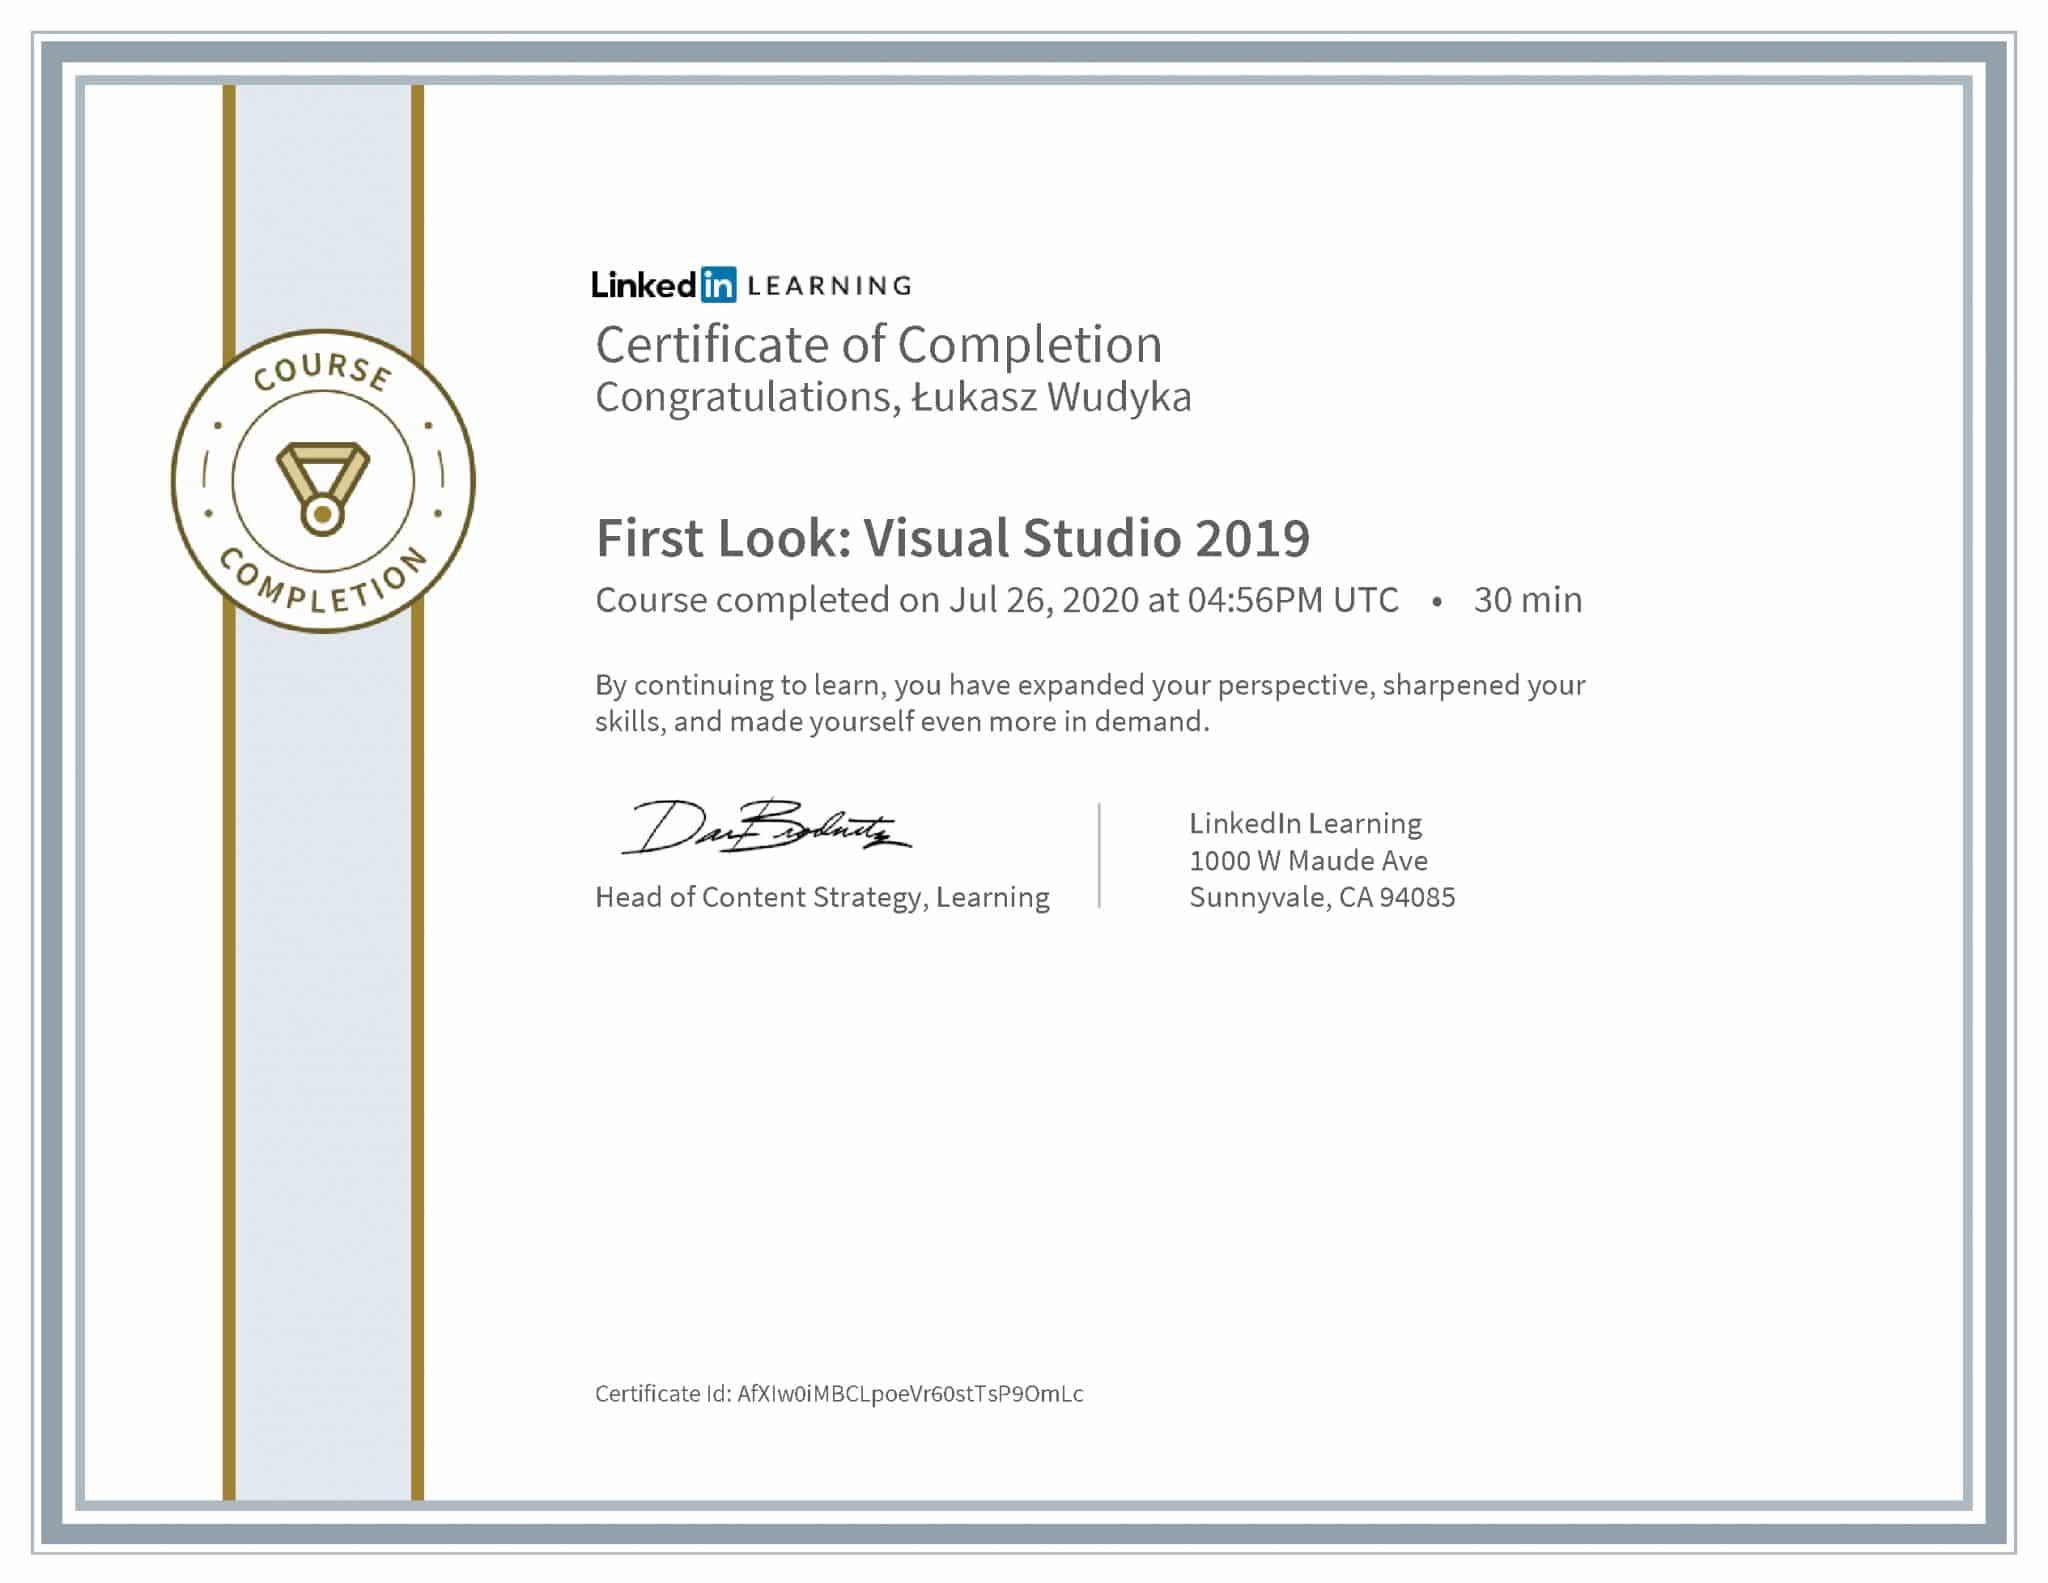 Łukasz Wudyka certyfikat LinkedIn First Look: Visual Studio 2019